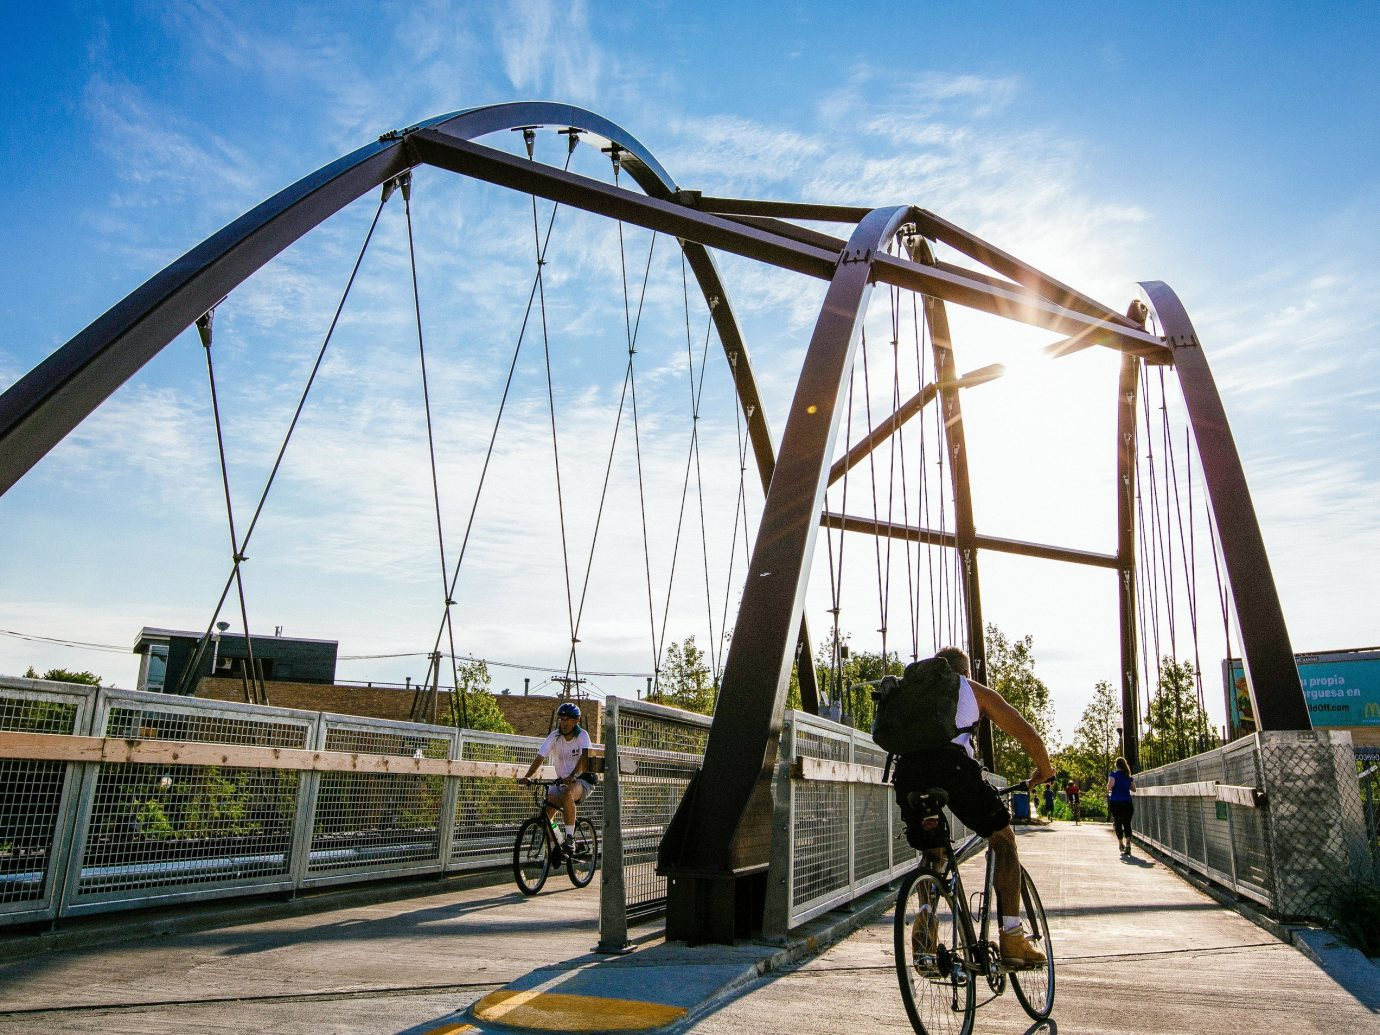 Trip Ideas sky outdoor truss bridge bridge transport park arch railing Playground